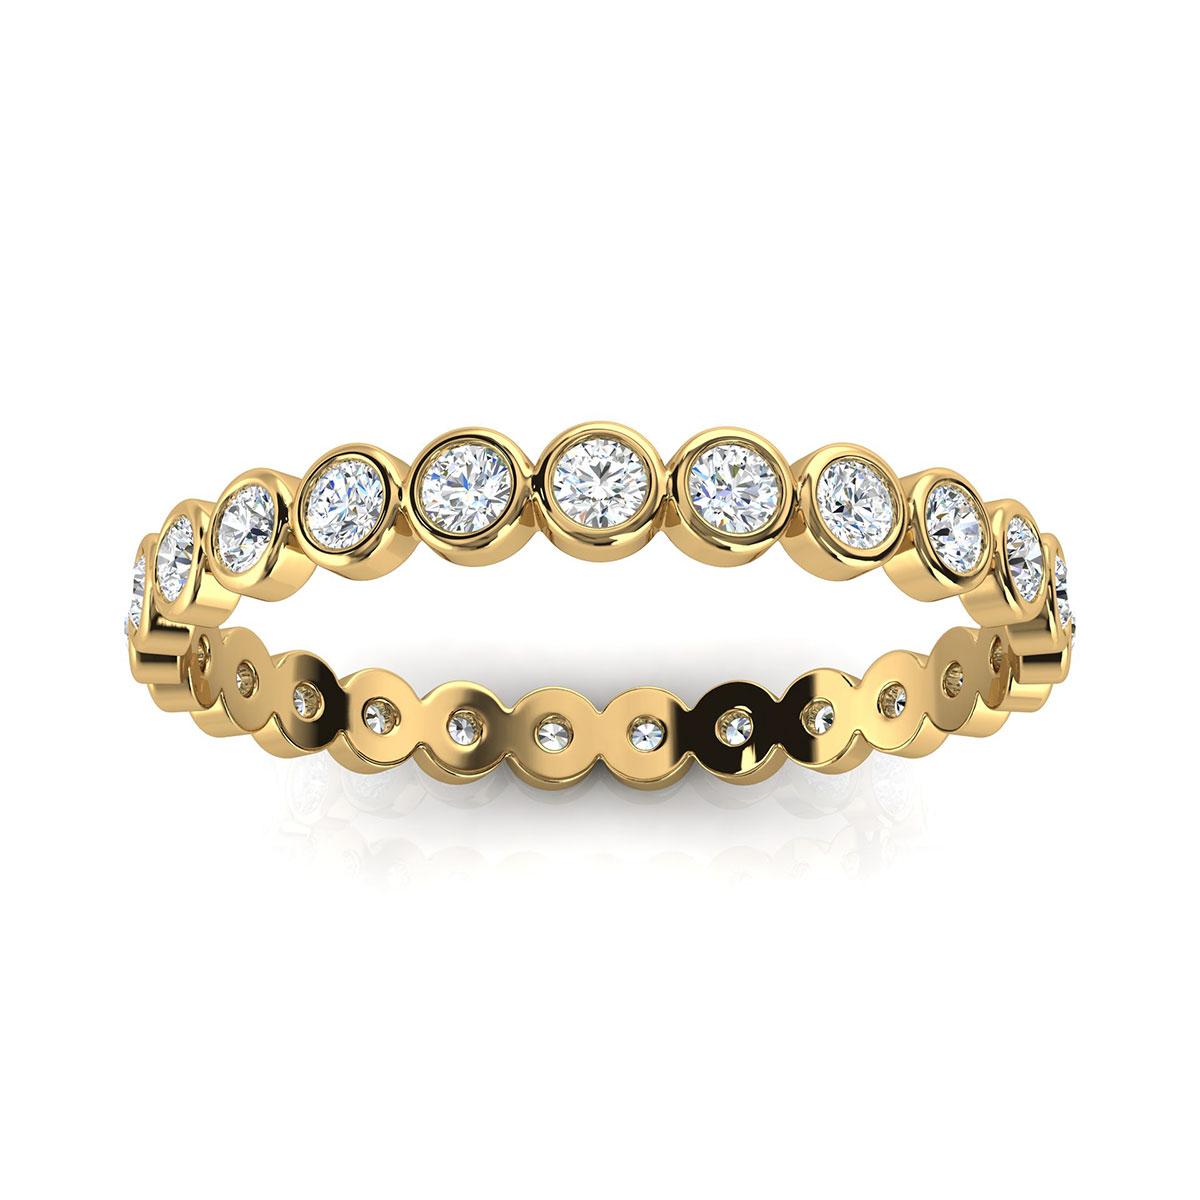 14K Yellow Gold Petite Zivit Eternity Diamond Ring (1/2 ct.tw)